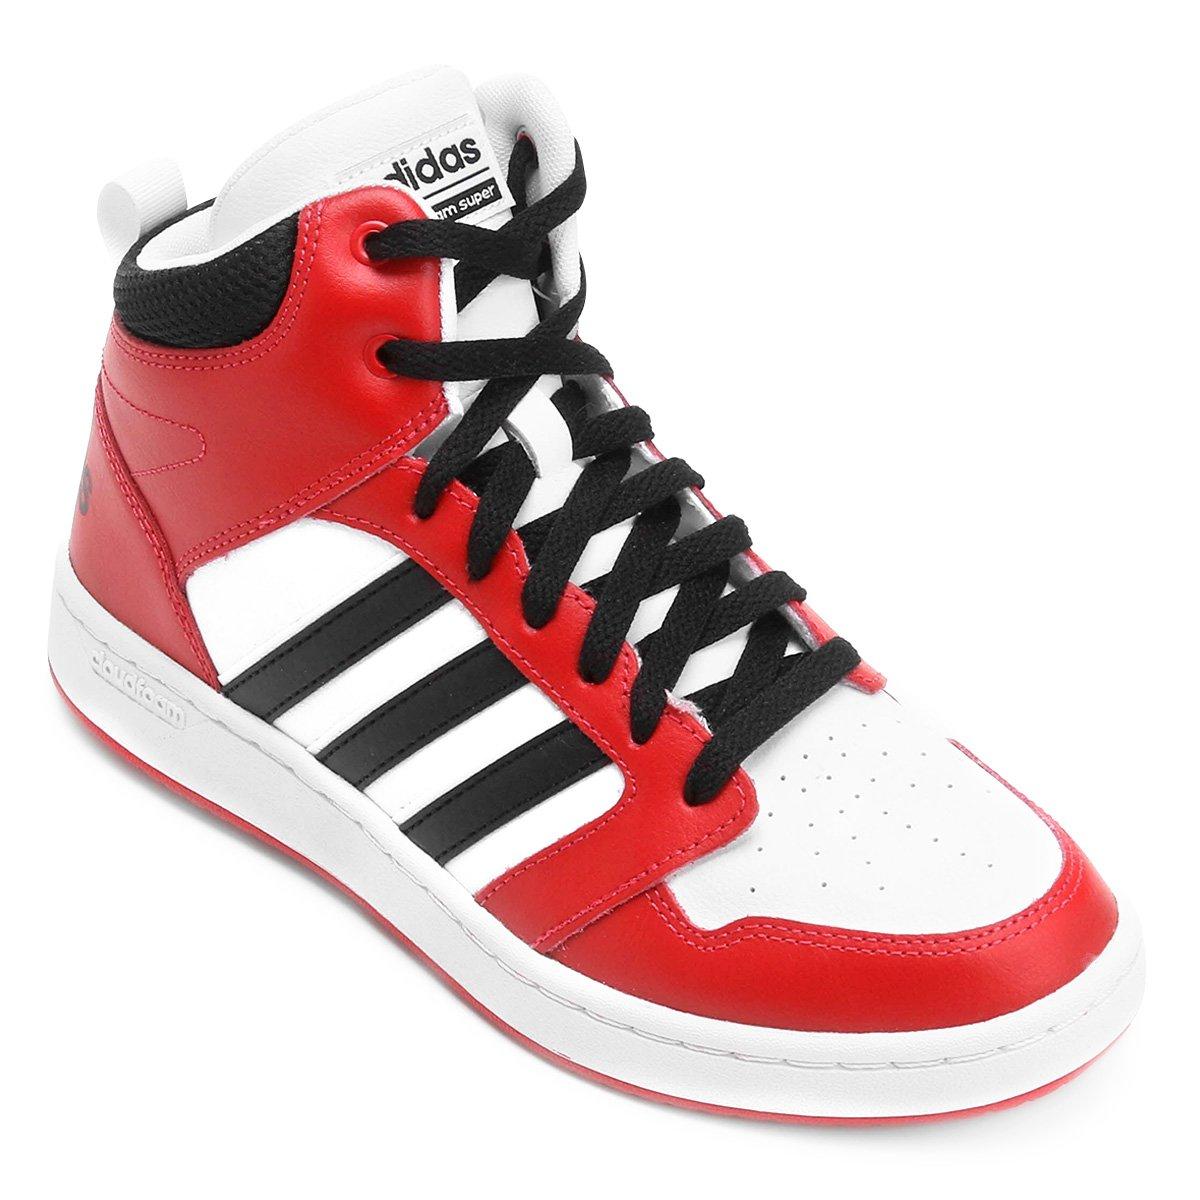 Tênis Couro Cano Alto Adidas Cf Super Hoops Mid Masculino - Compre ... f66c7db66b89c